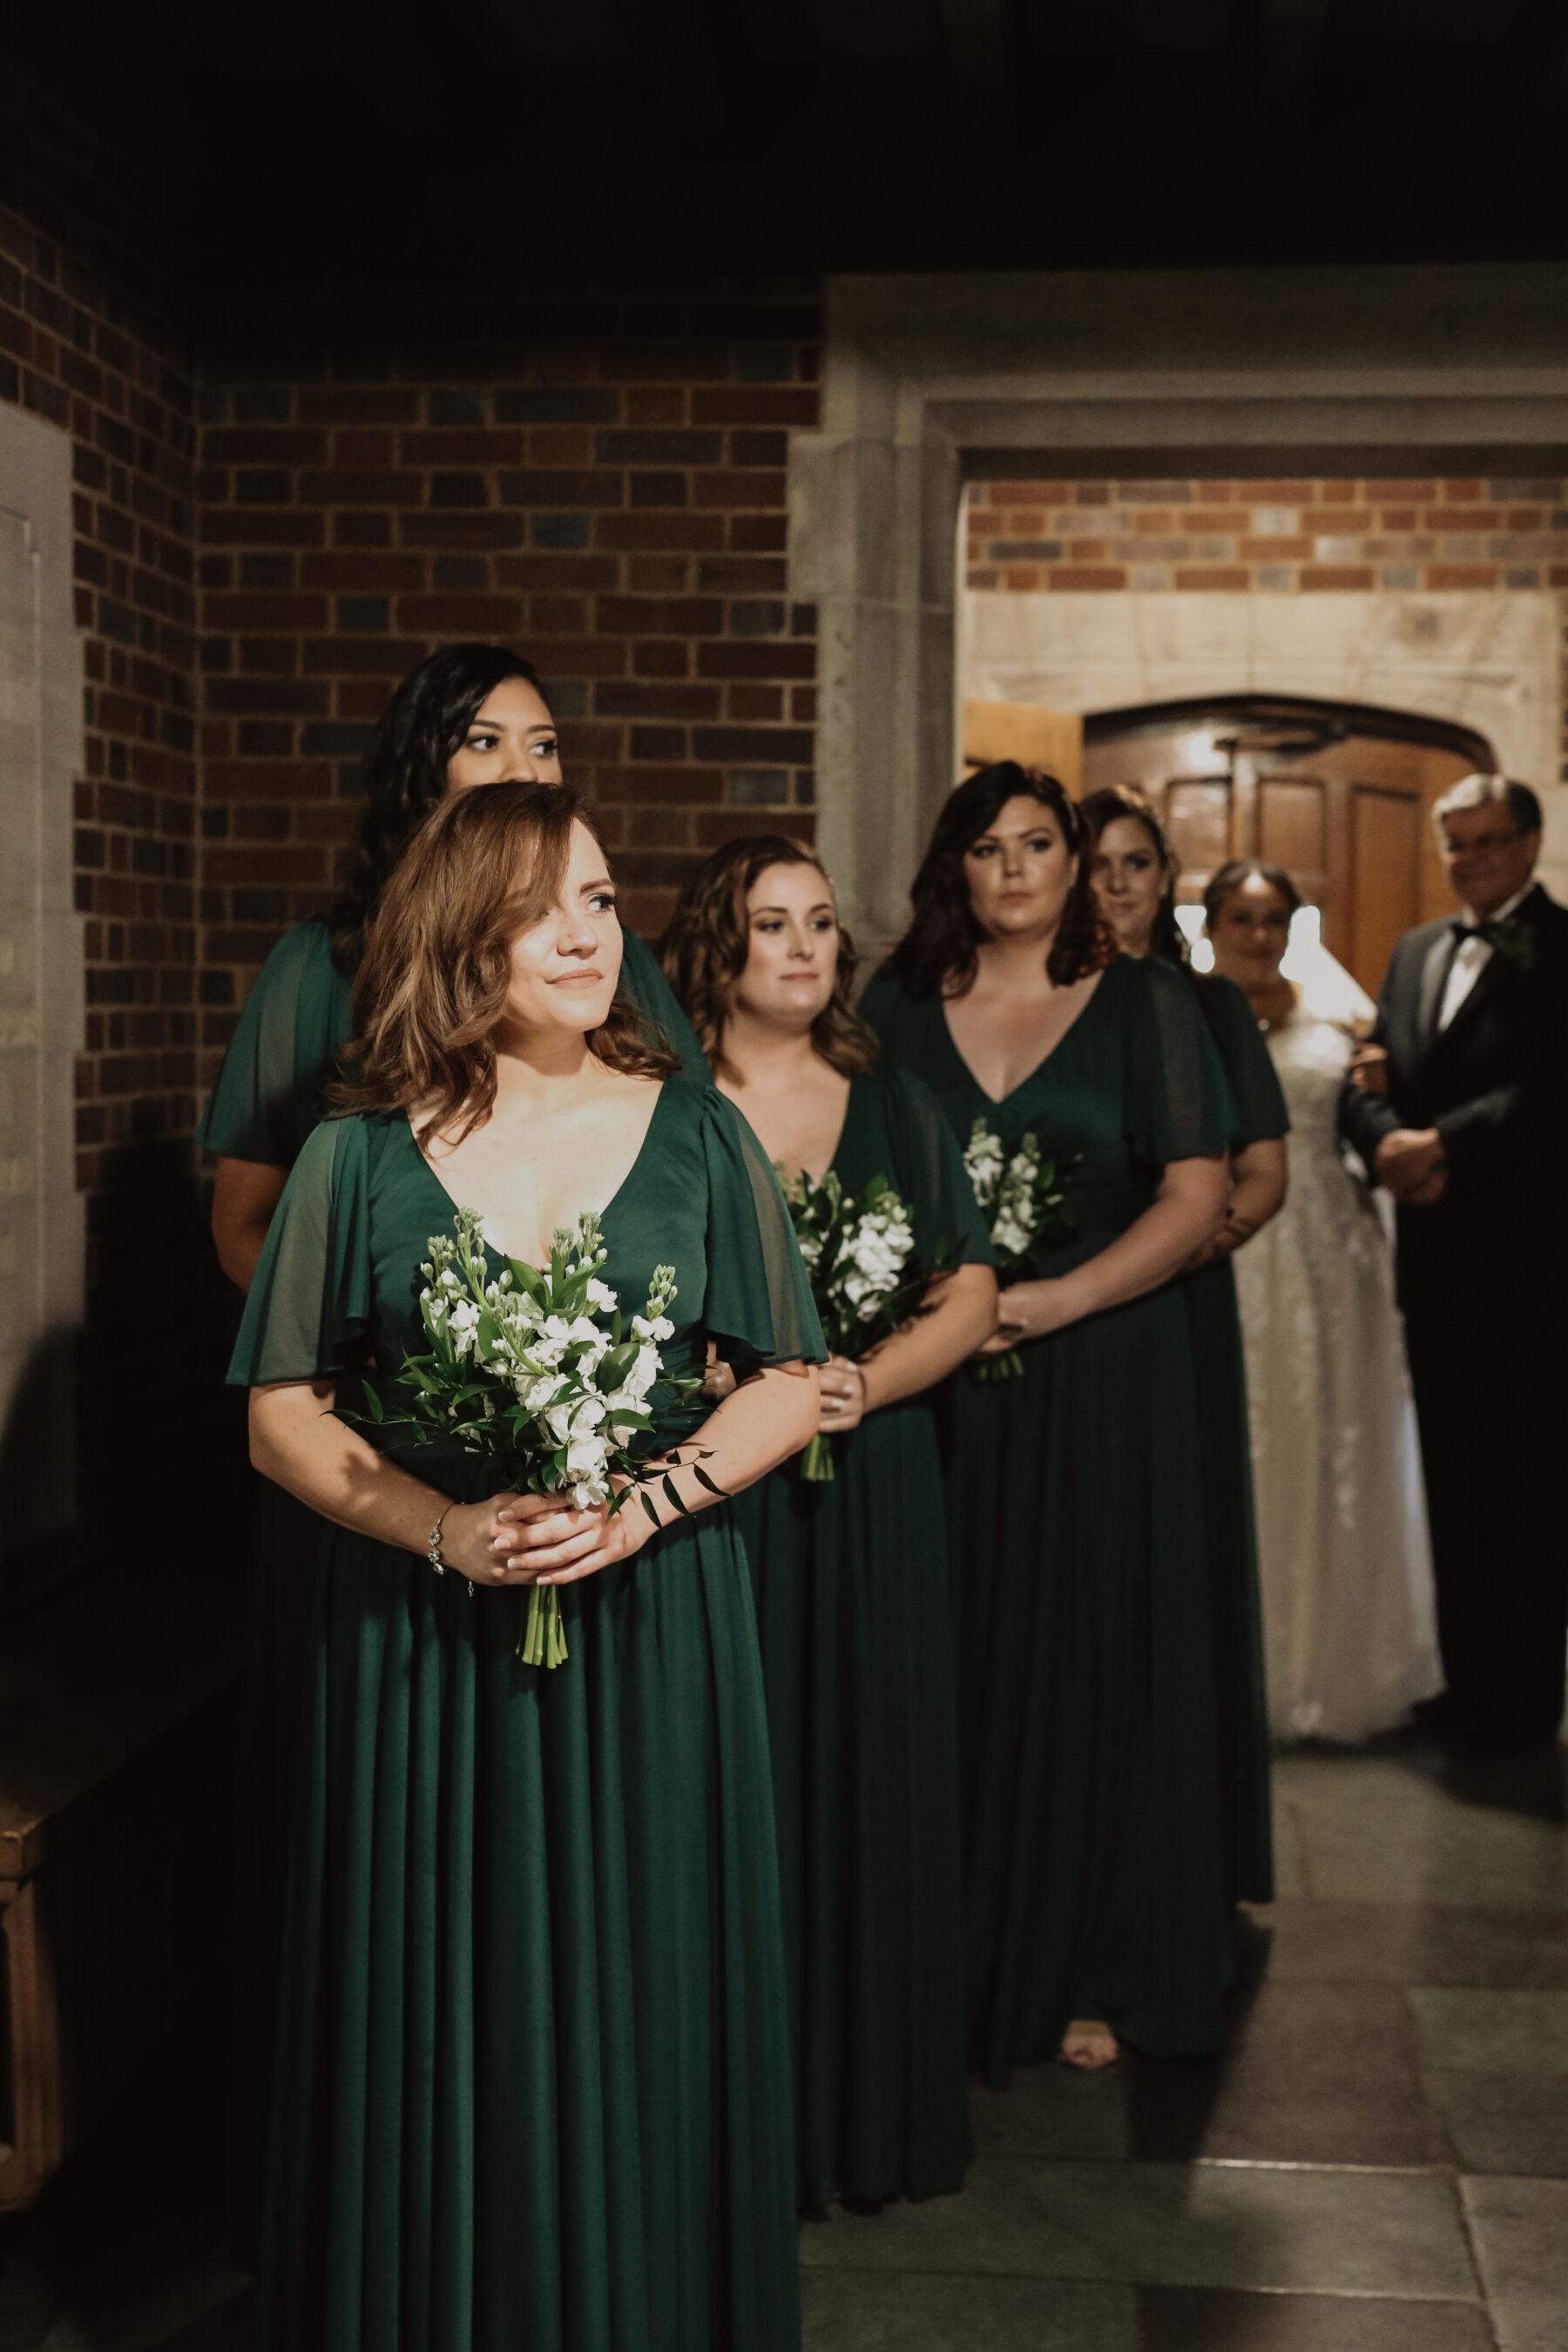 Emerald green bridesmaid dresses | Nashville Bride Guide